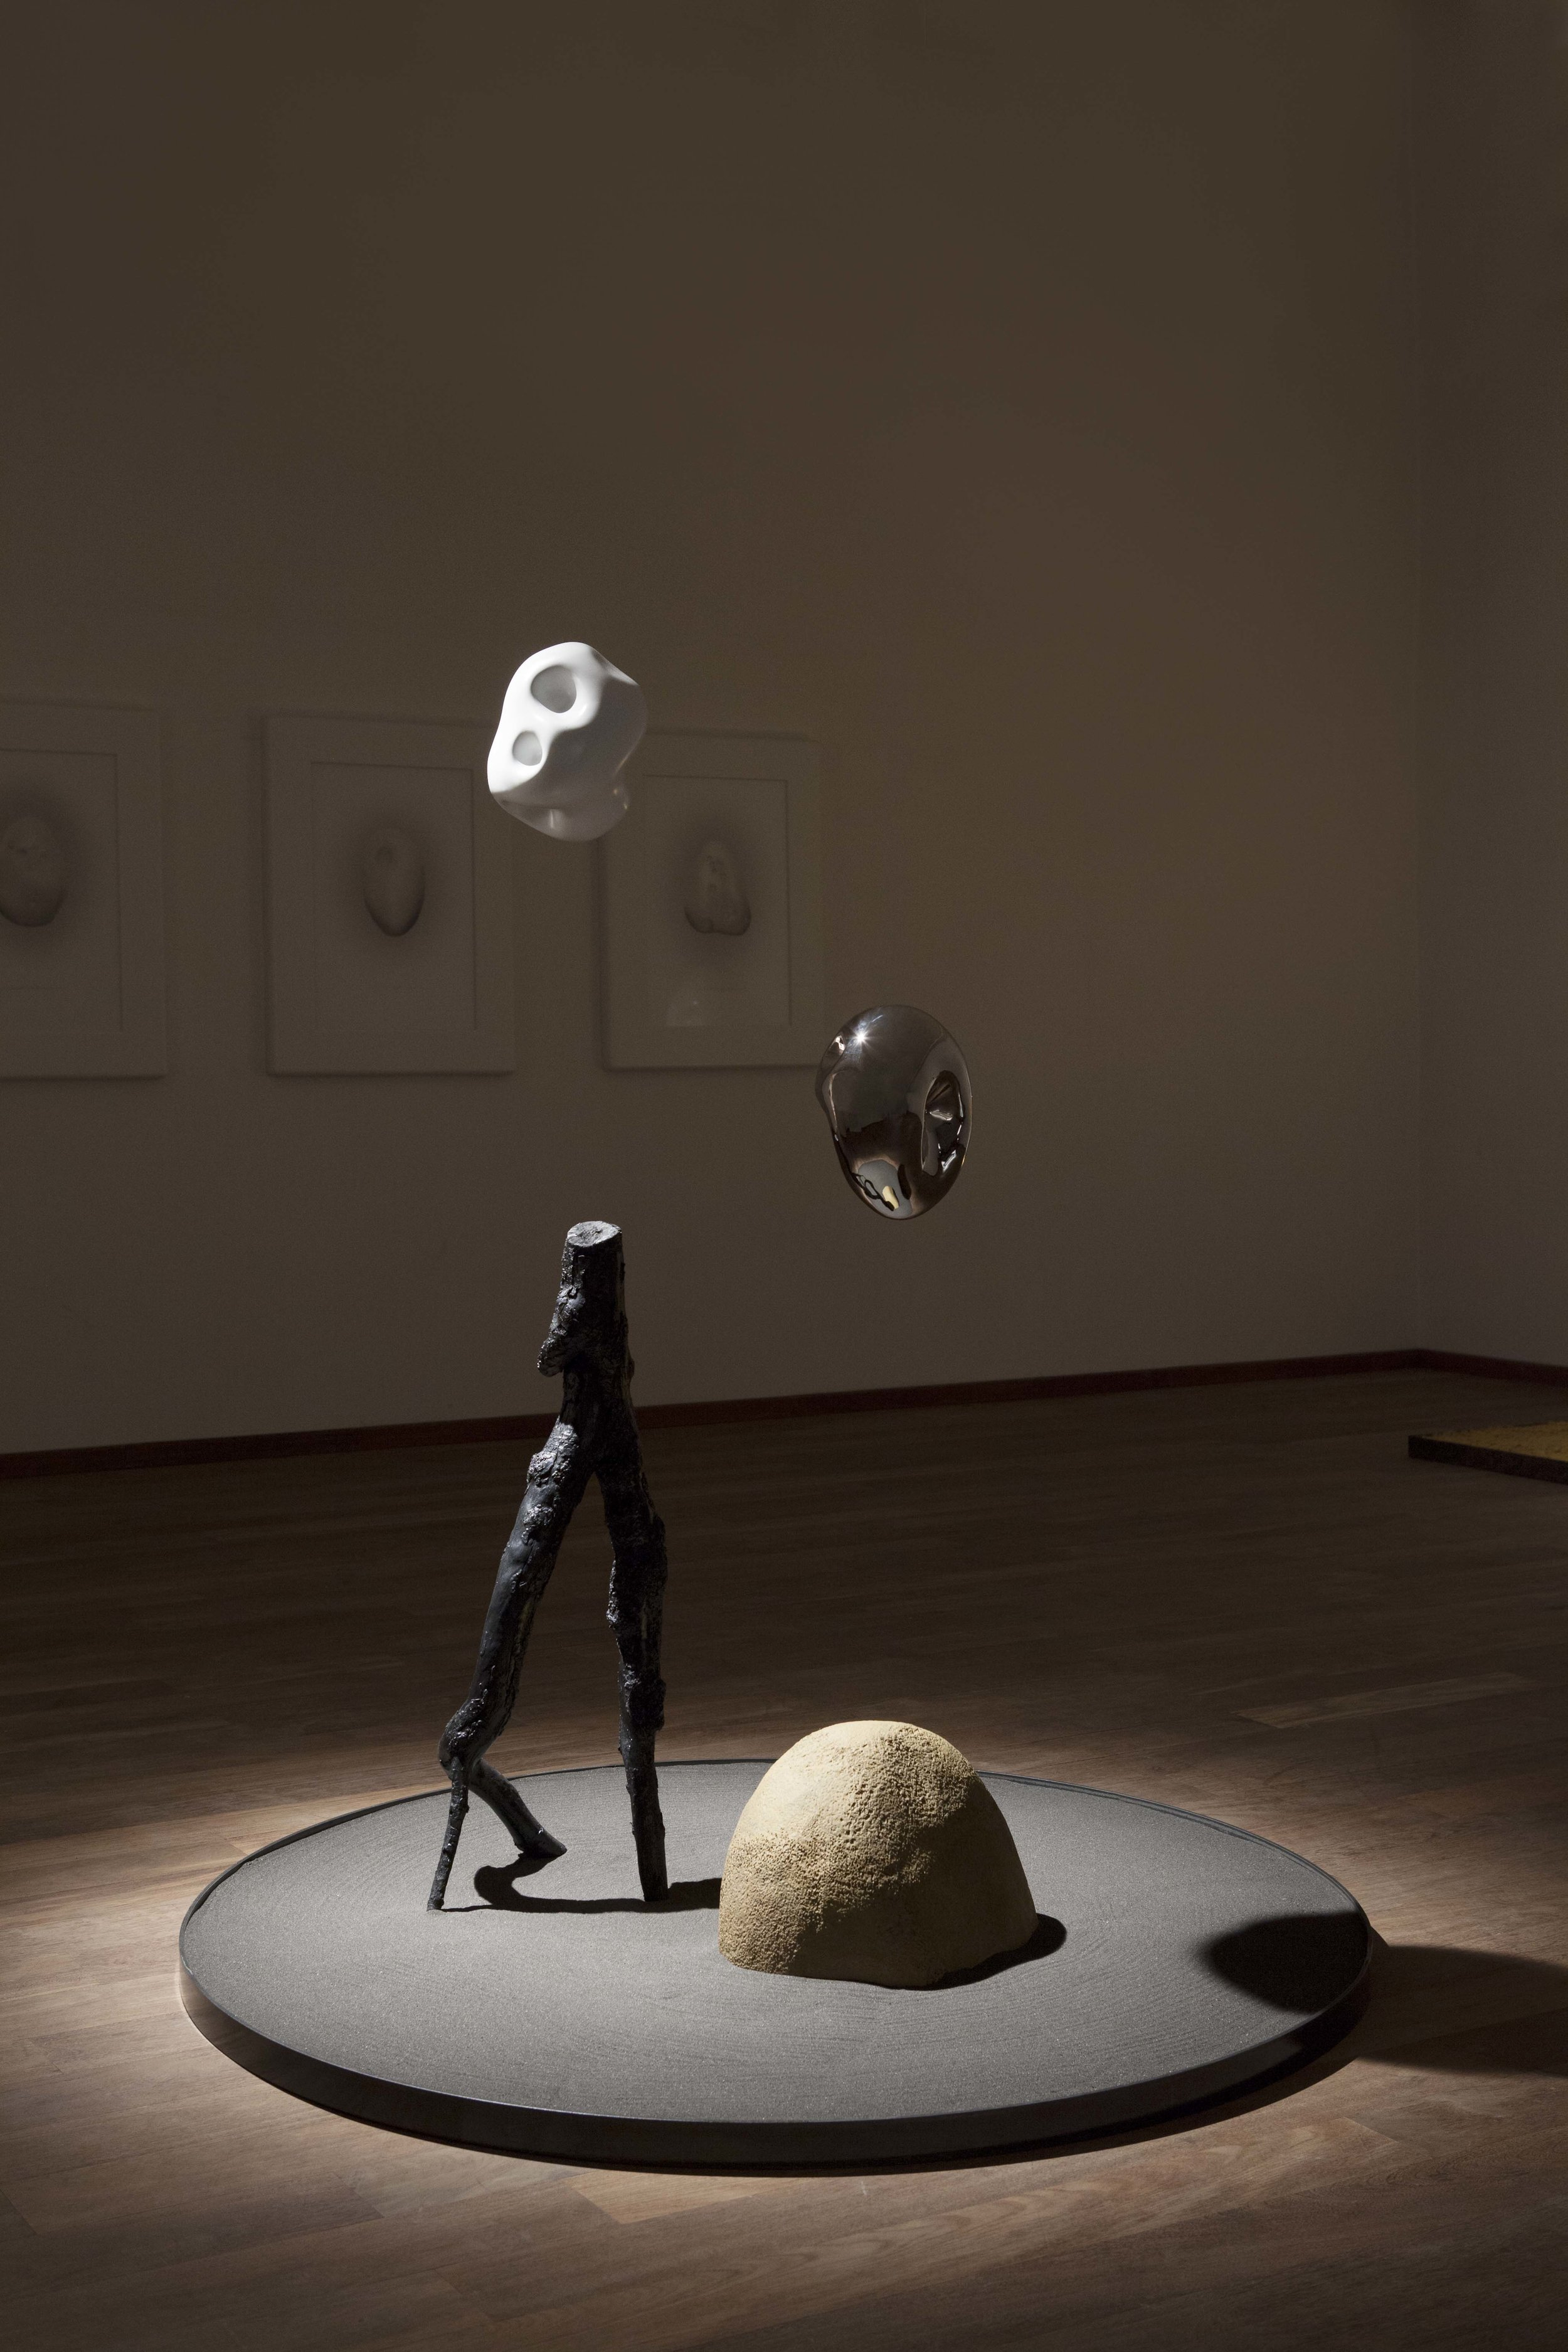 Elastozen and Elastogenese by Artist Richard Texier